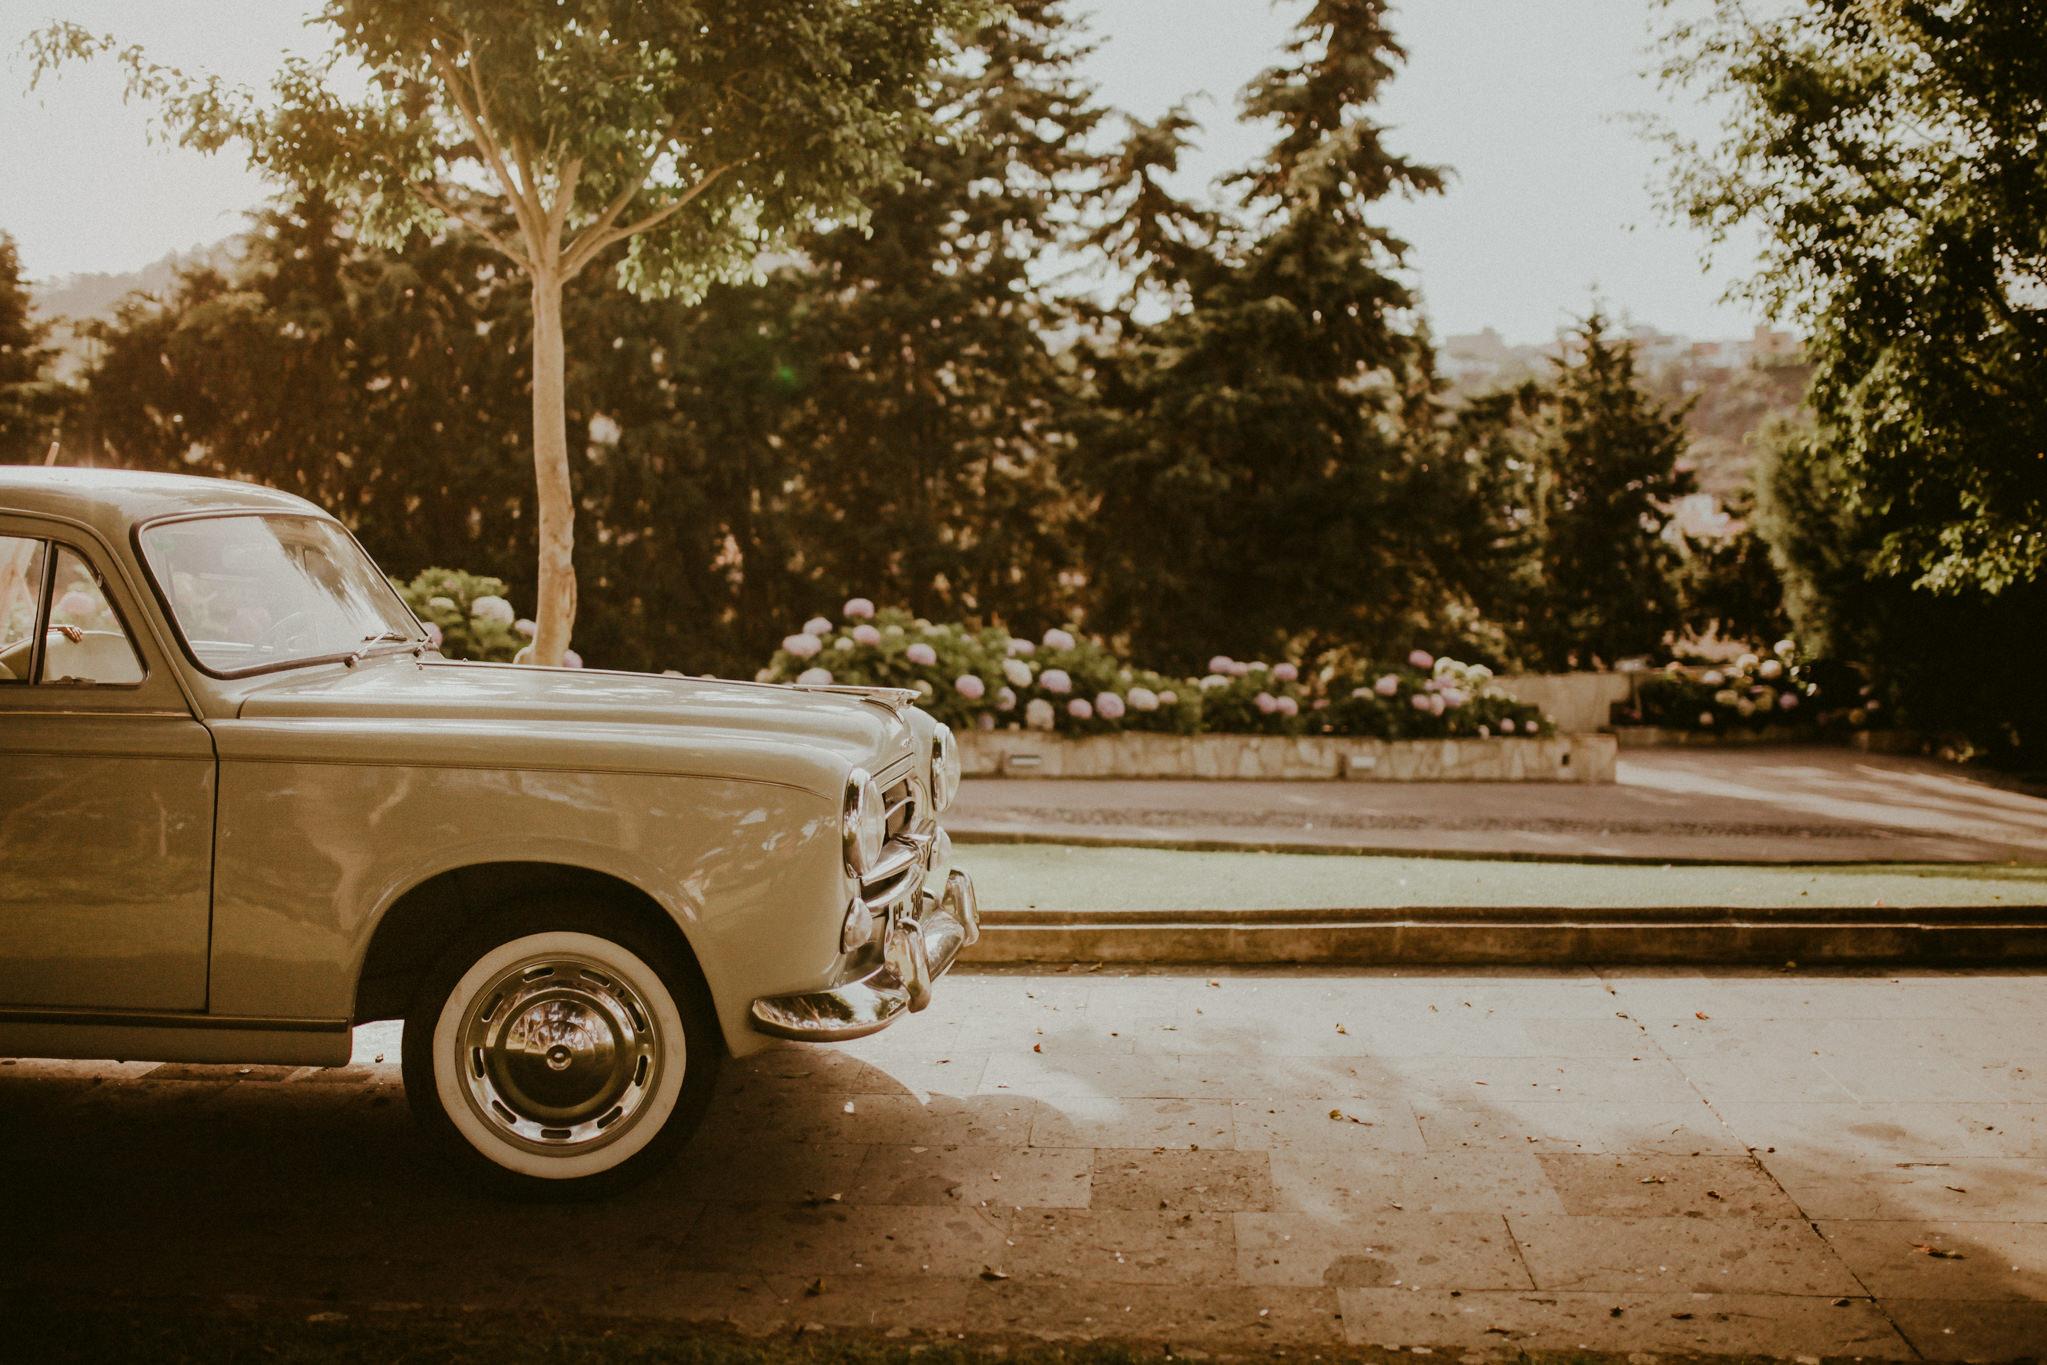 boda-diferente-fotografo-boda-laspalmas-grancanaria-59